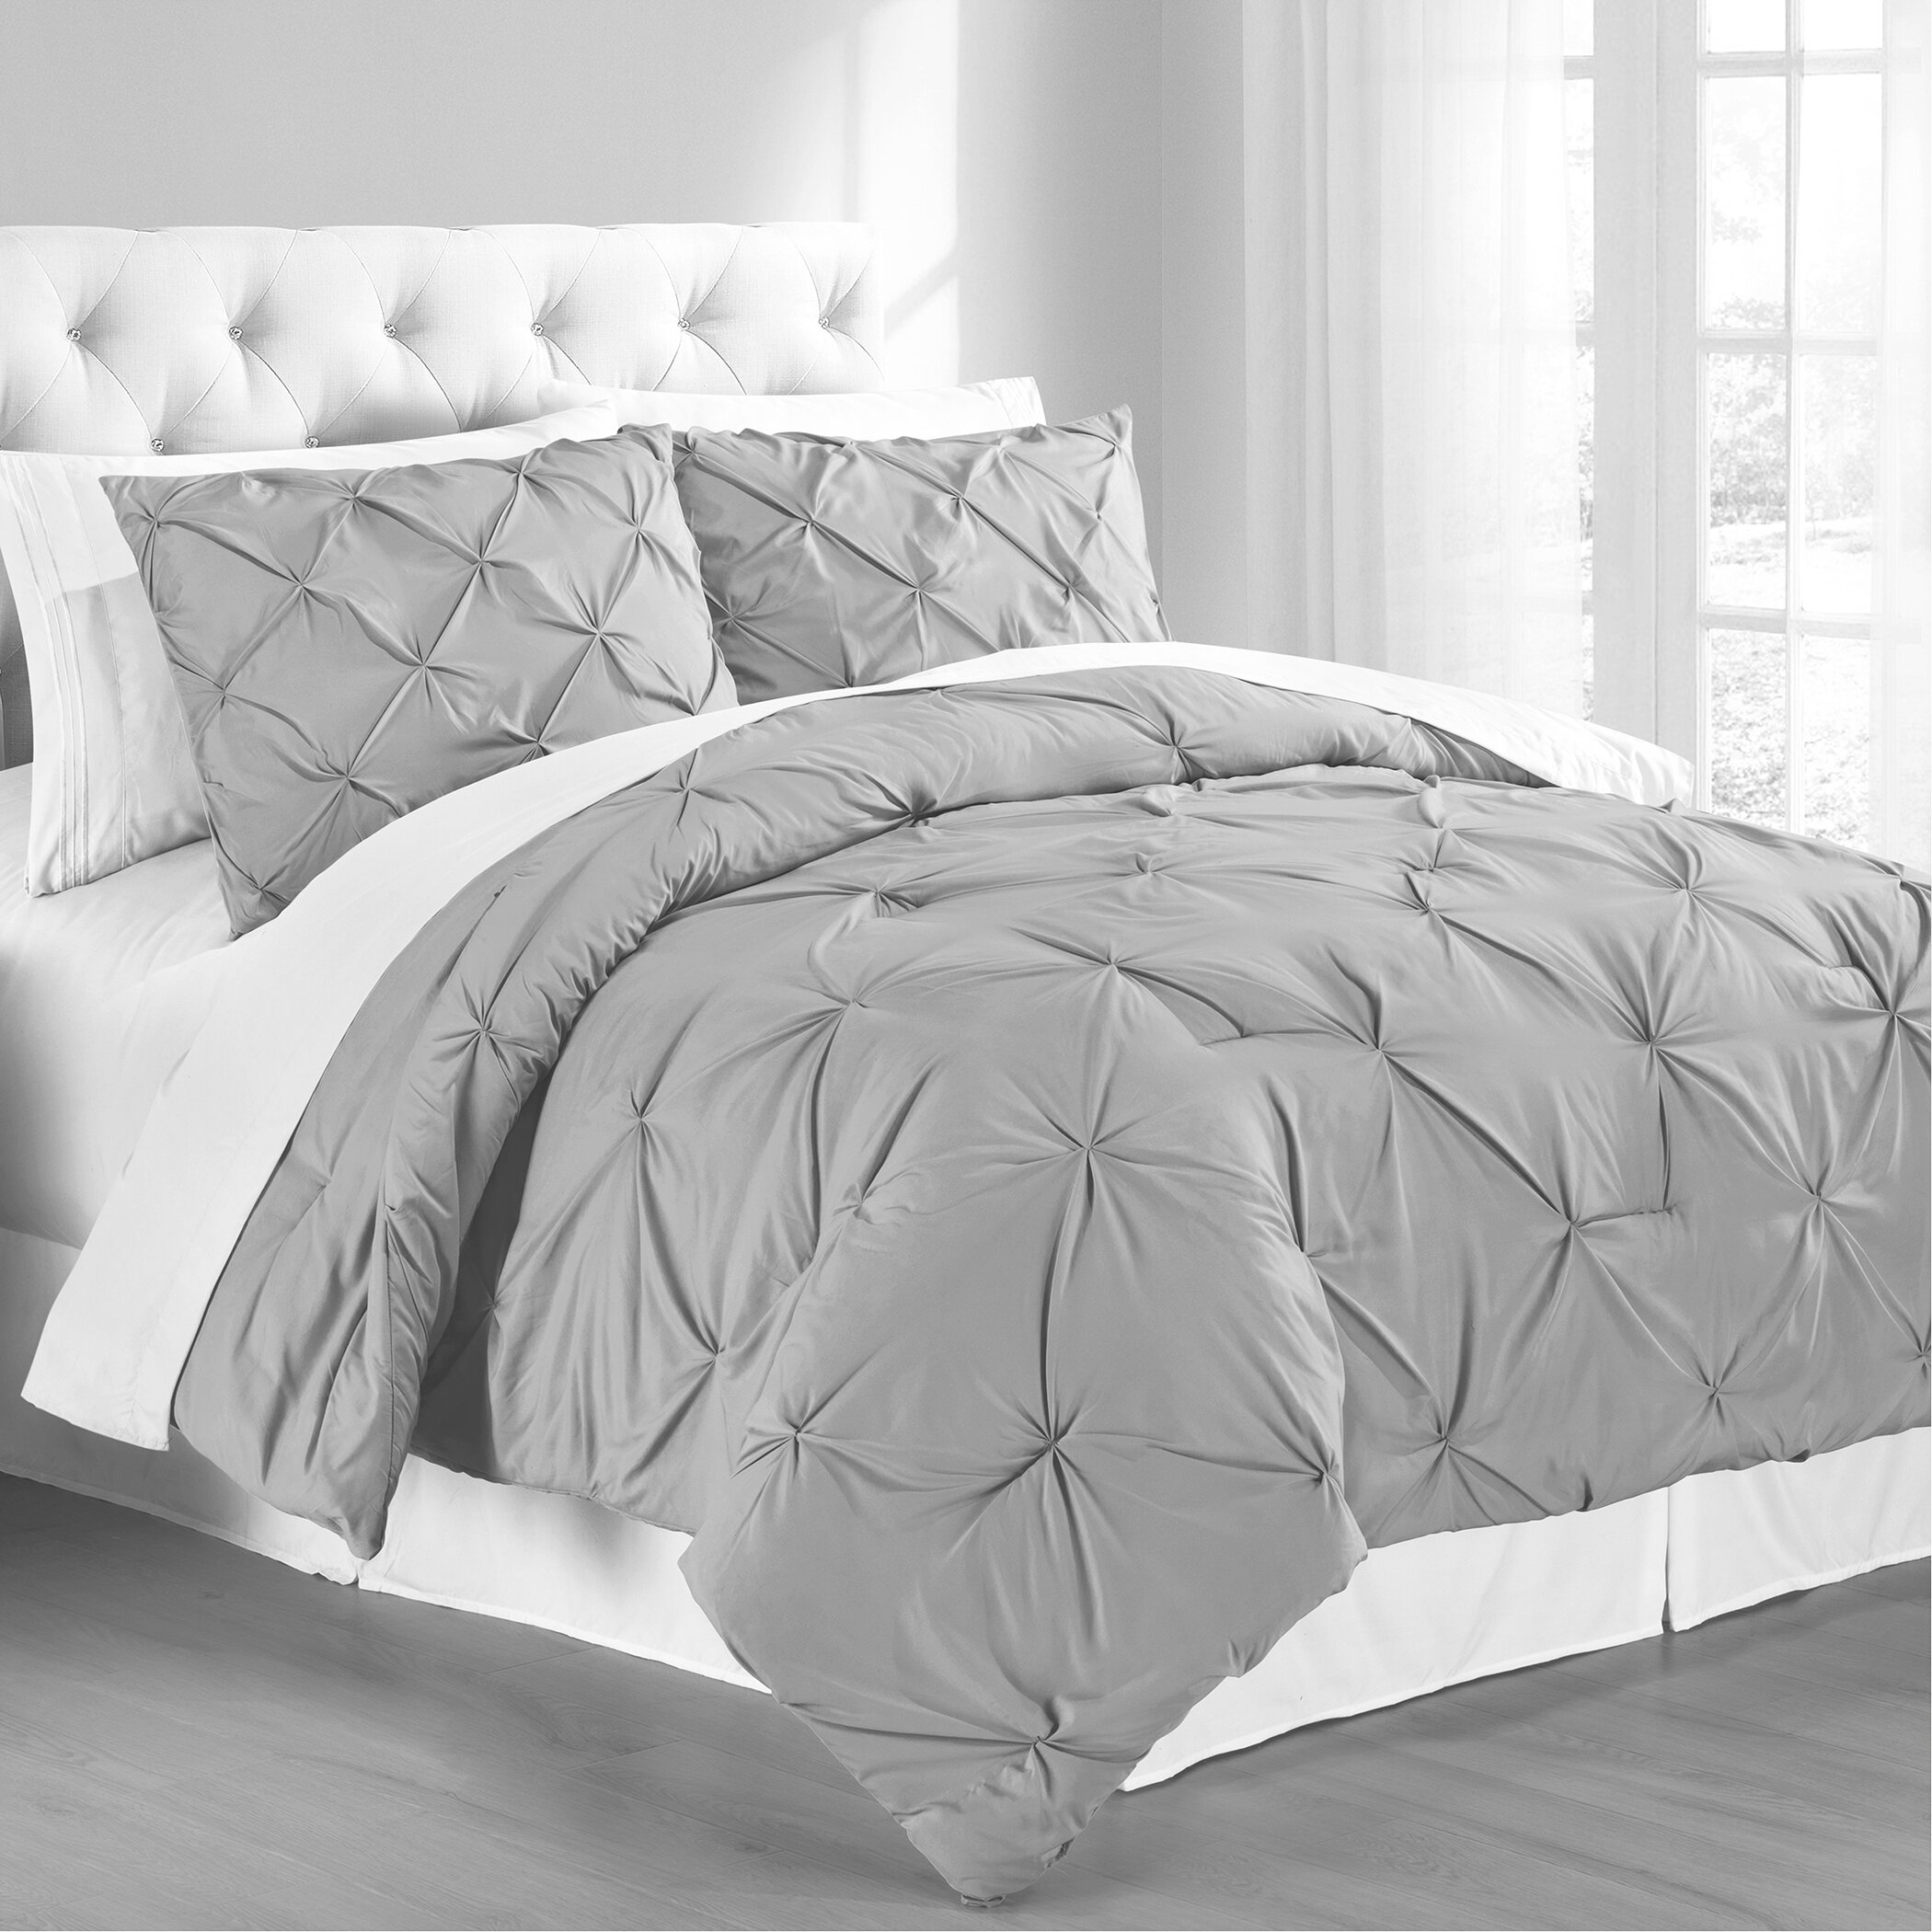 Gray Comforter Sets Free Shipping Over 35 Wayfair